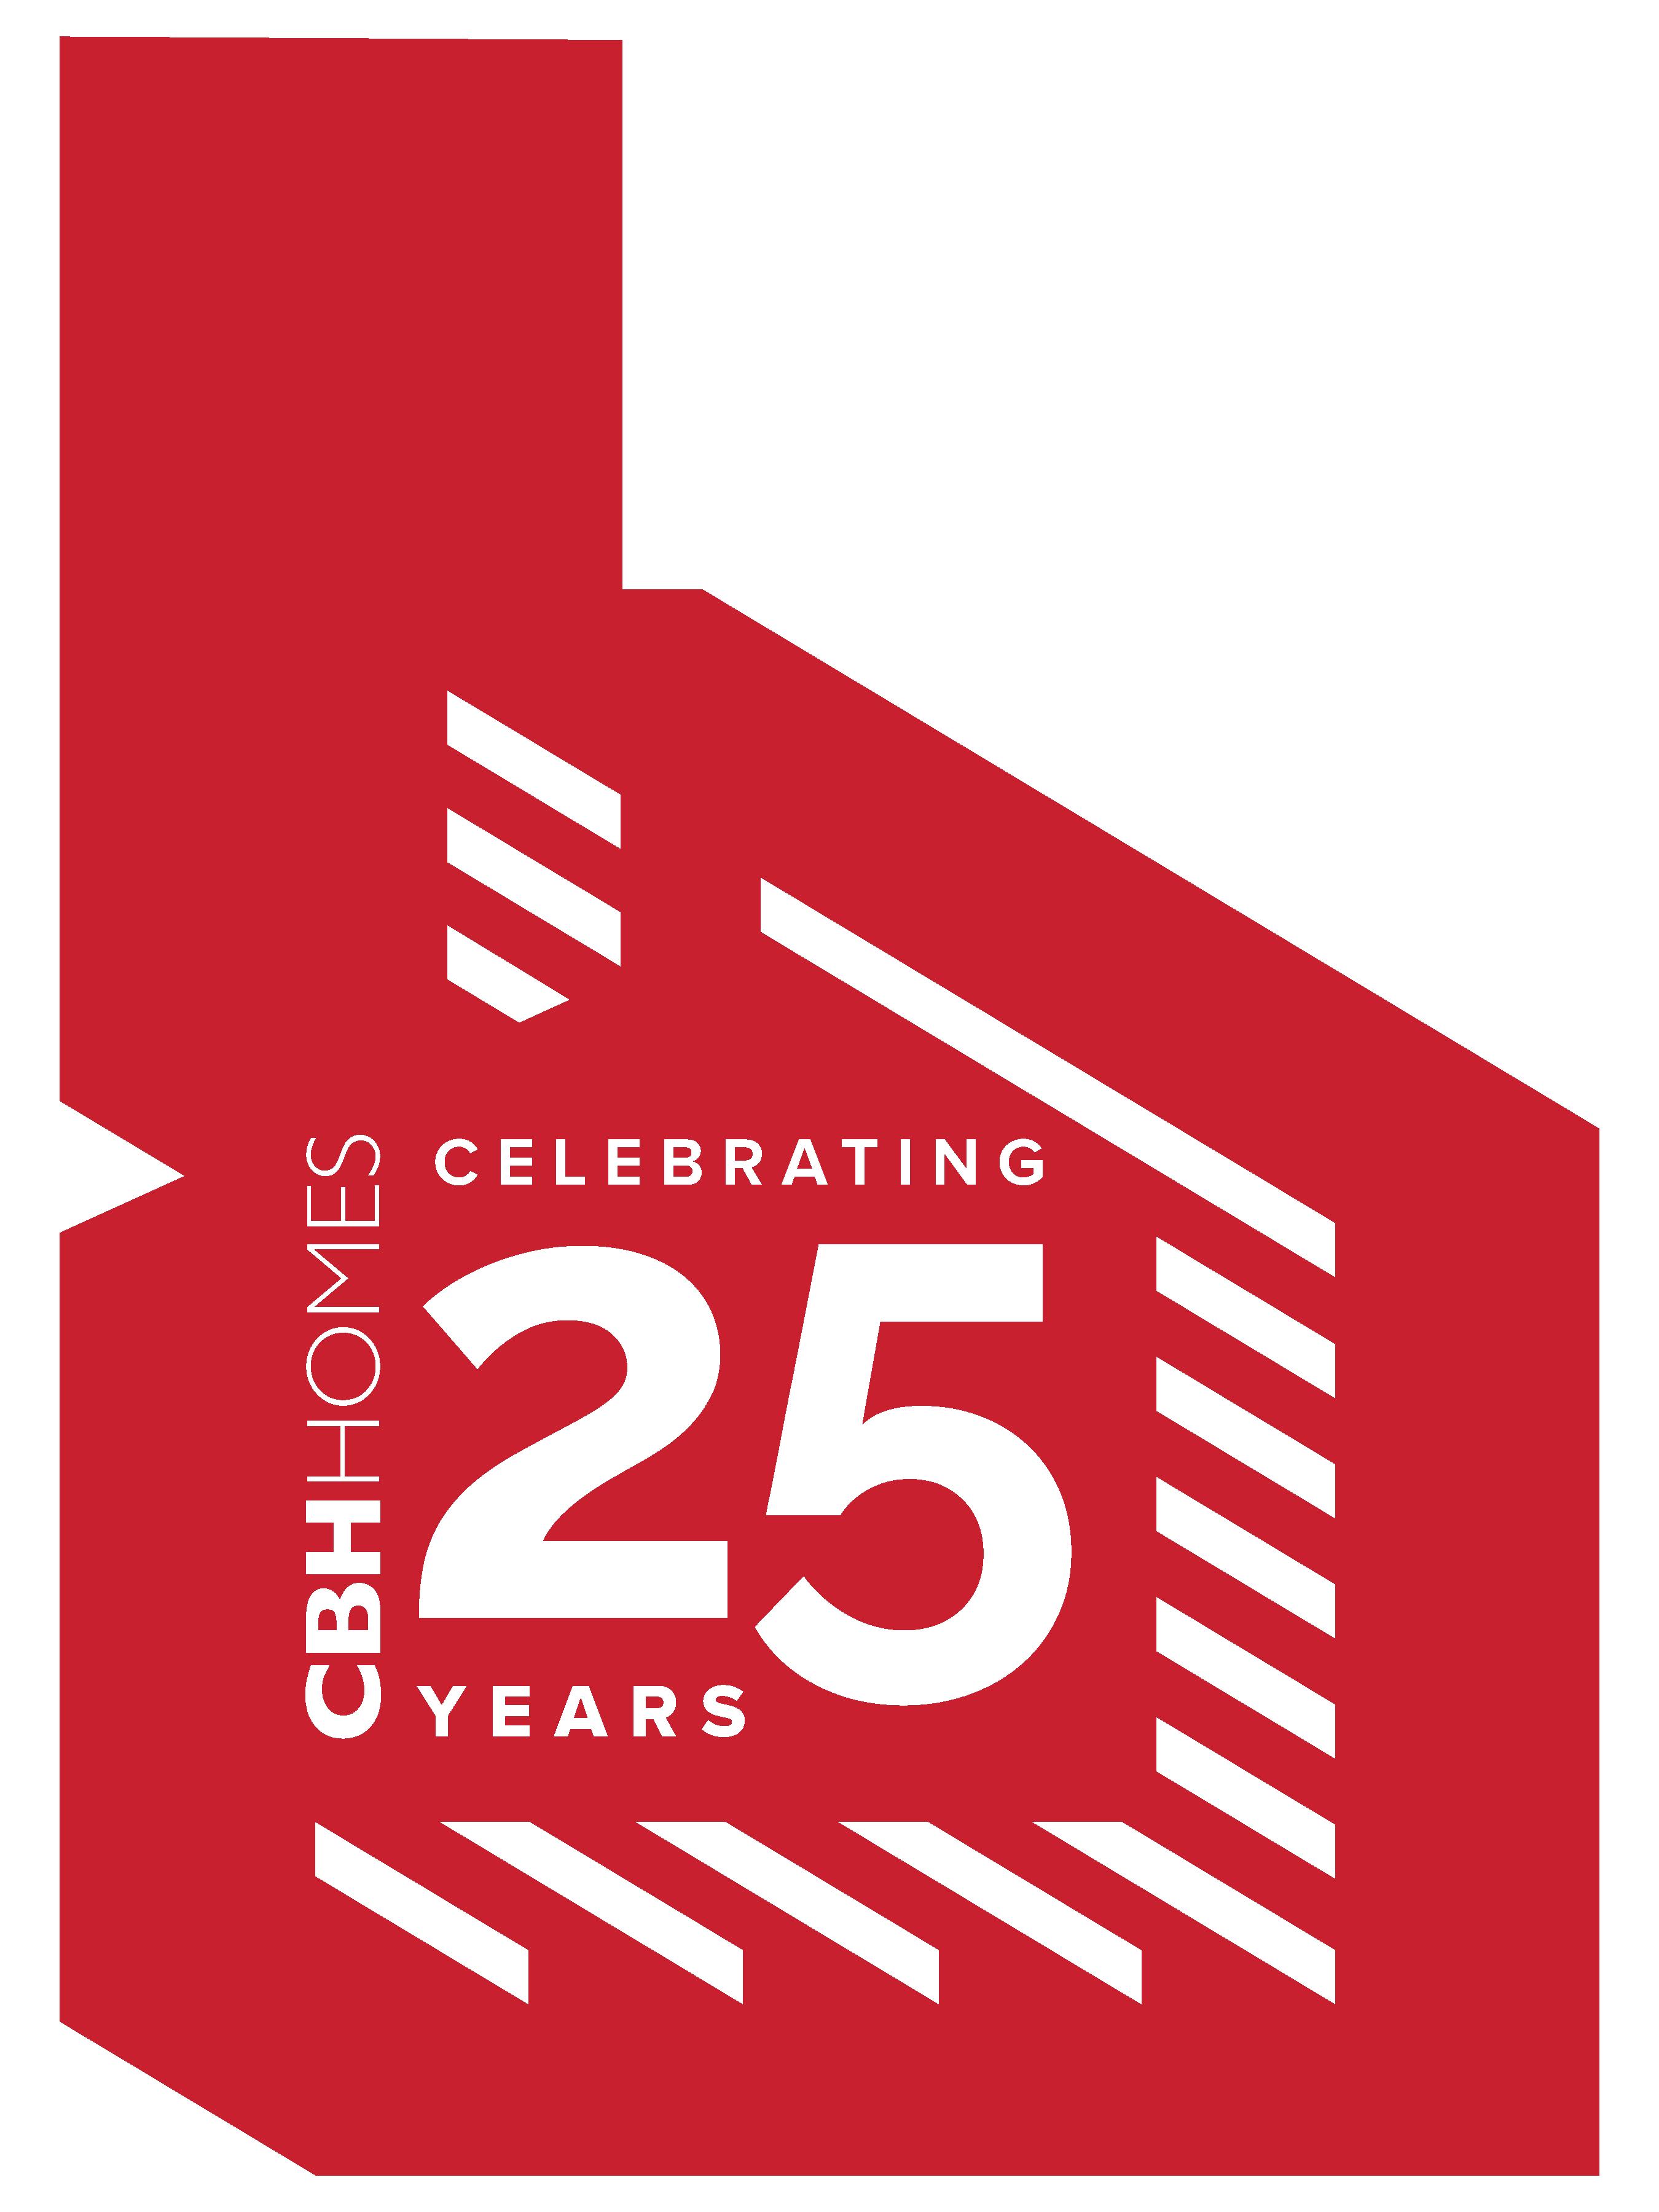 cbh_25yrlogo_5-high-res-red